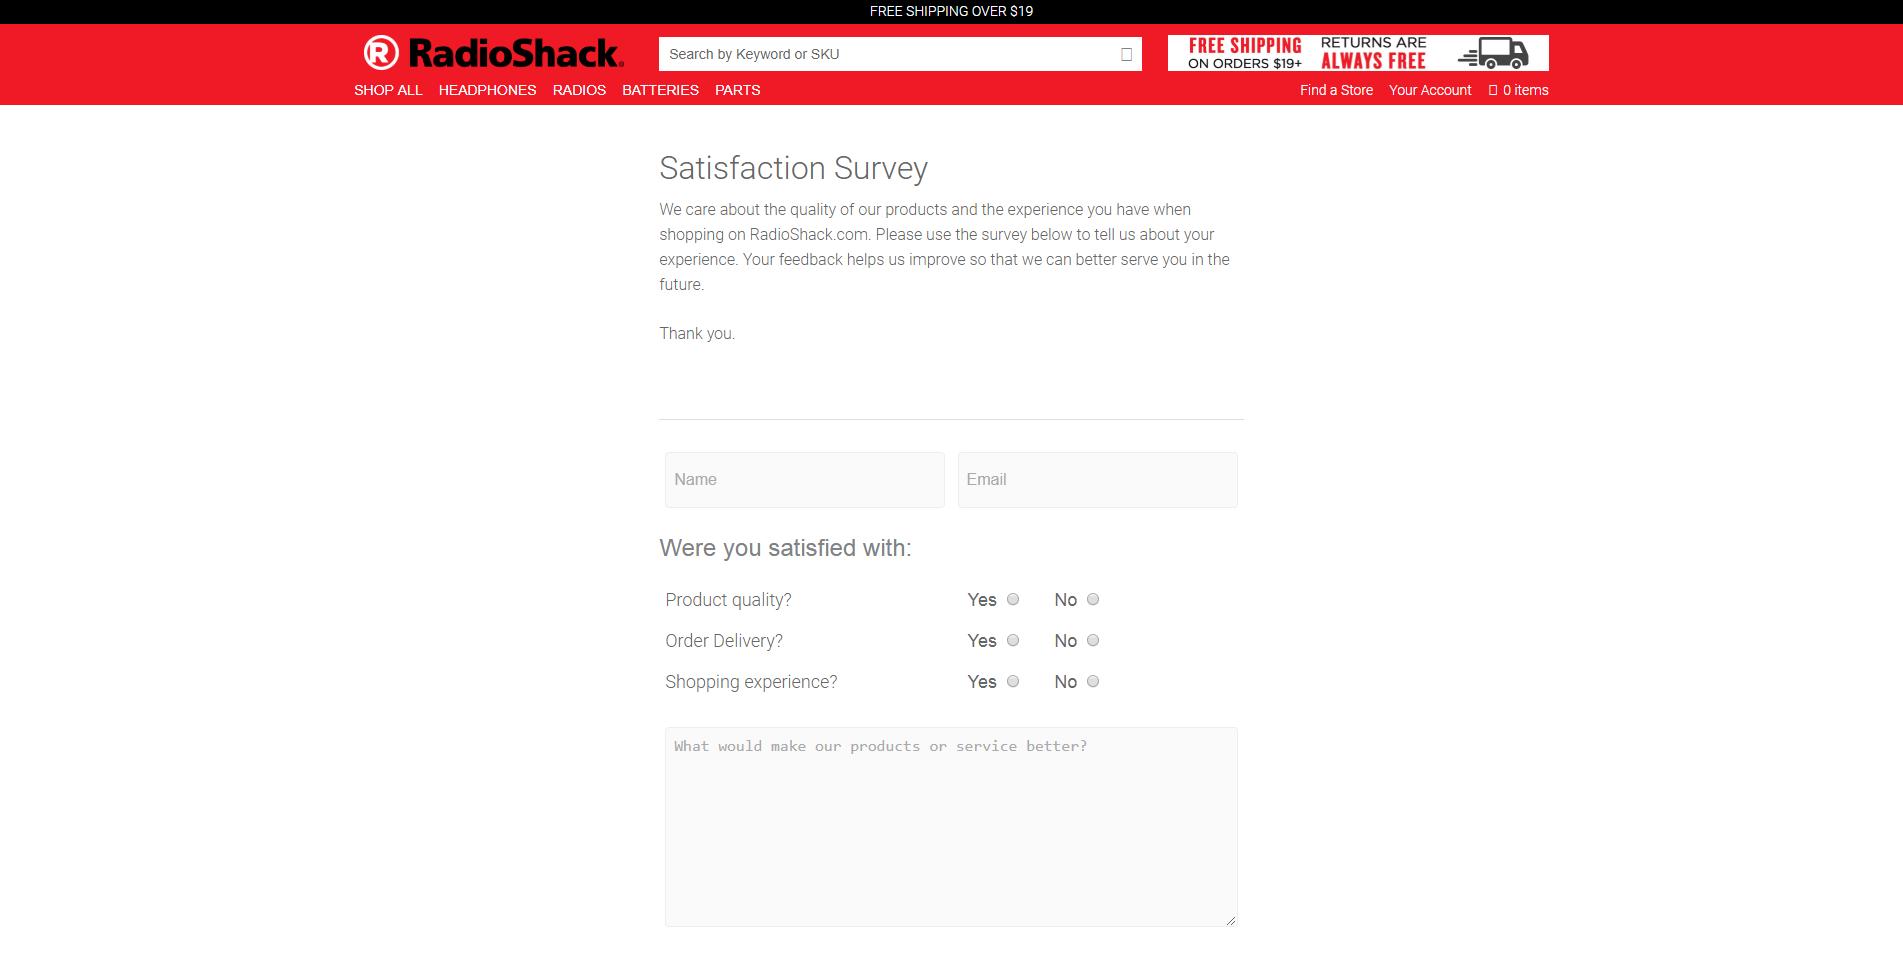 www.radioshack.com/pages/satisfaction-survey